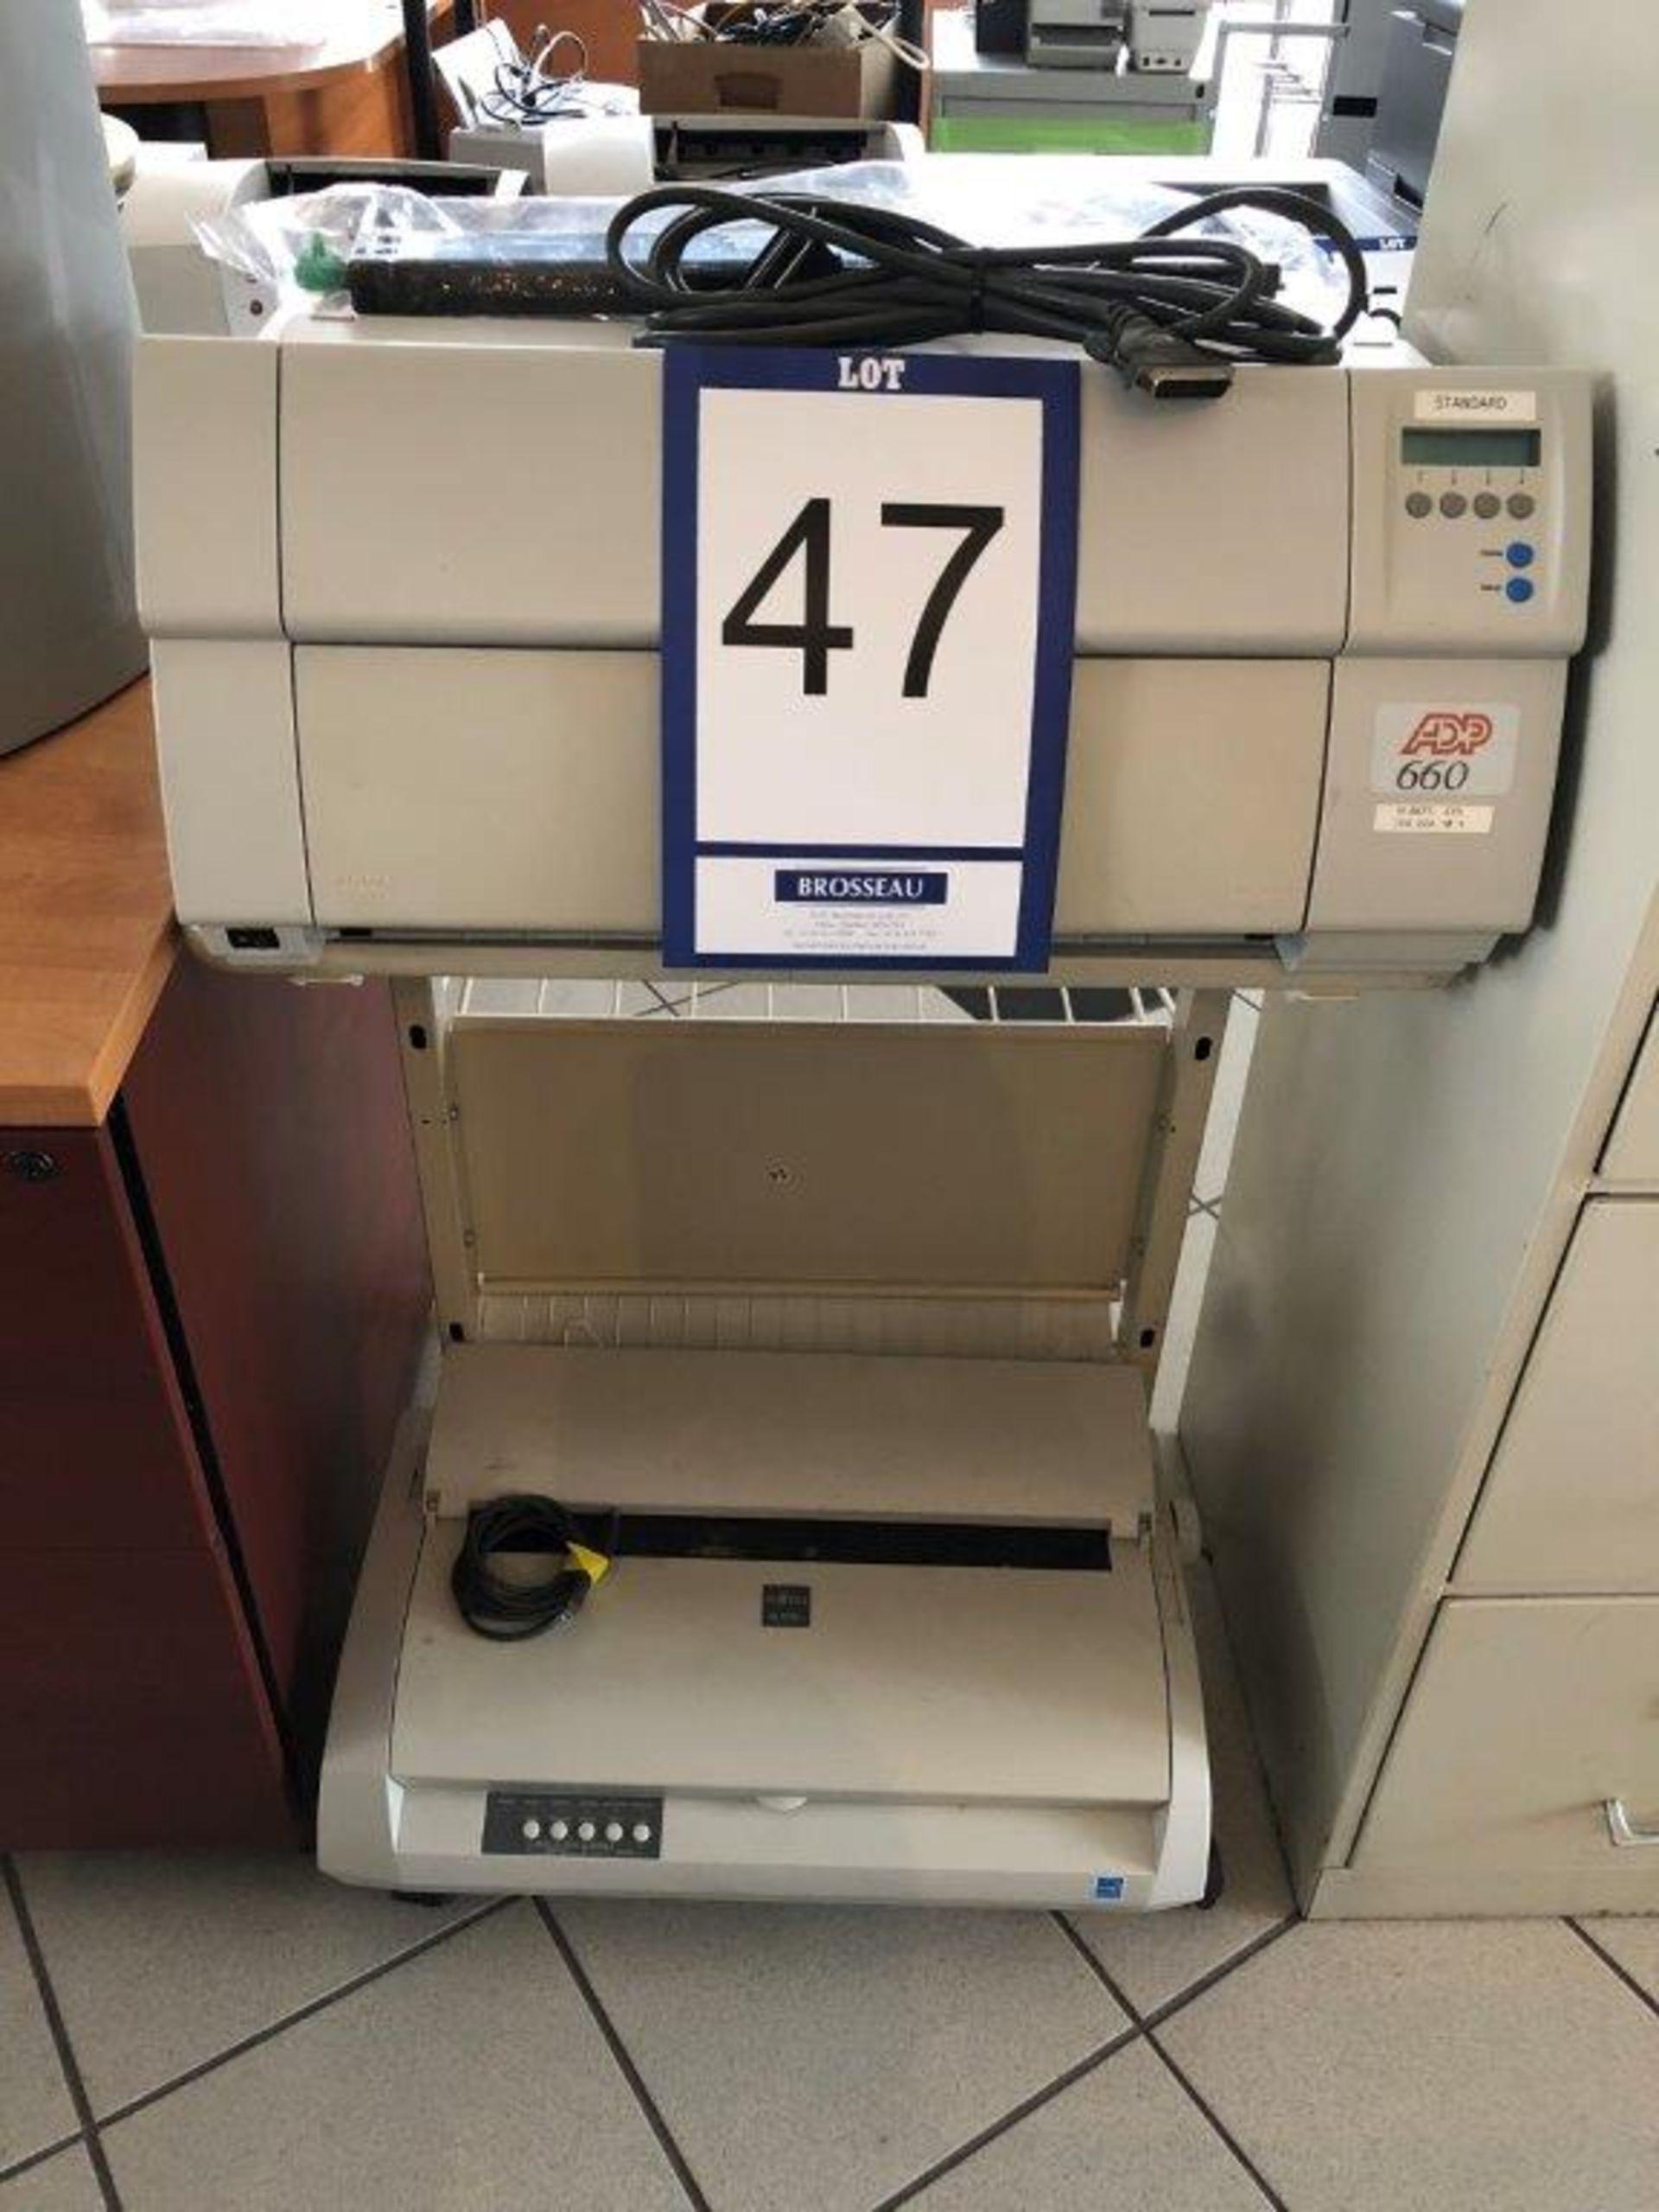 Lot 47 - Lot: cabinet avec imprimante ADP 660 et imprimante FUJITSU Mod. DL3850+